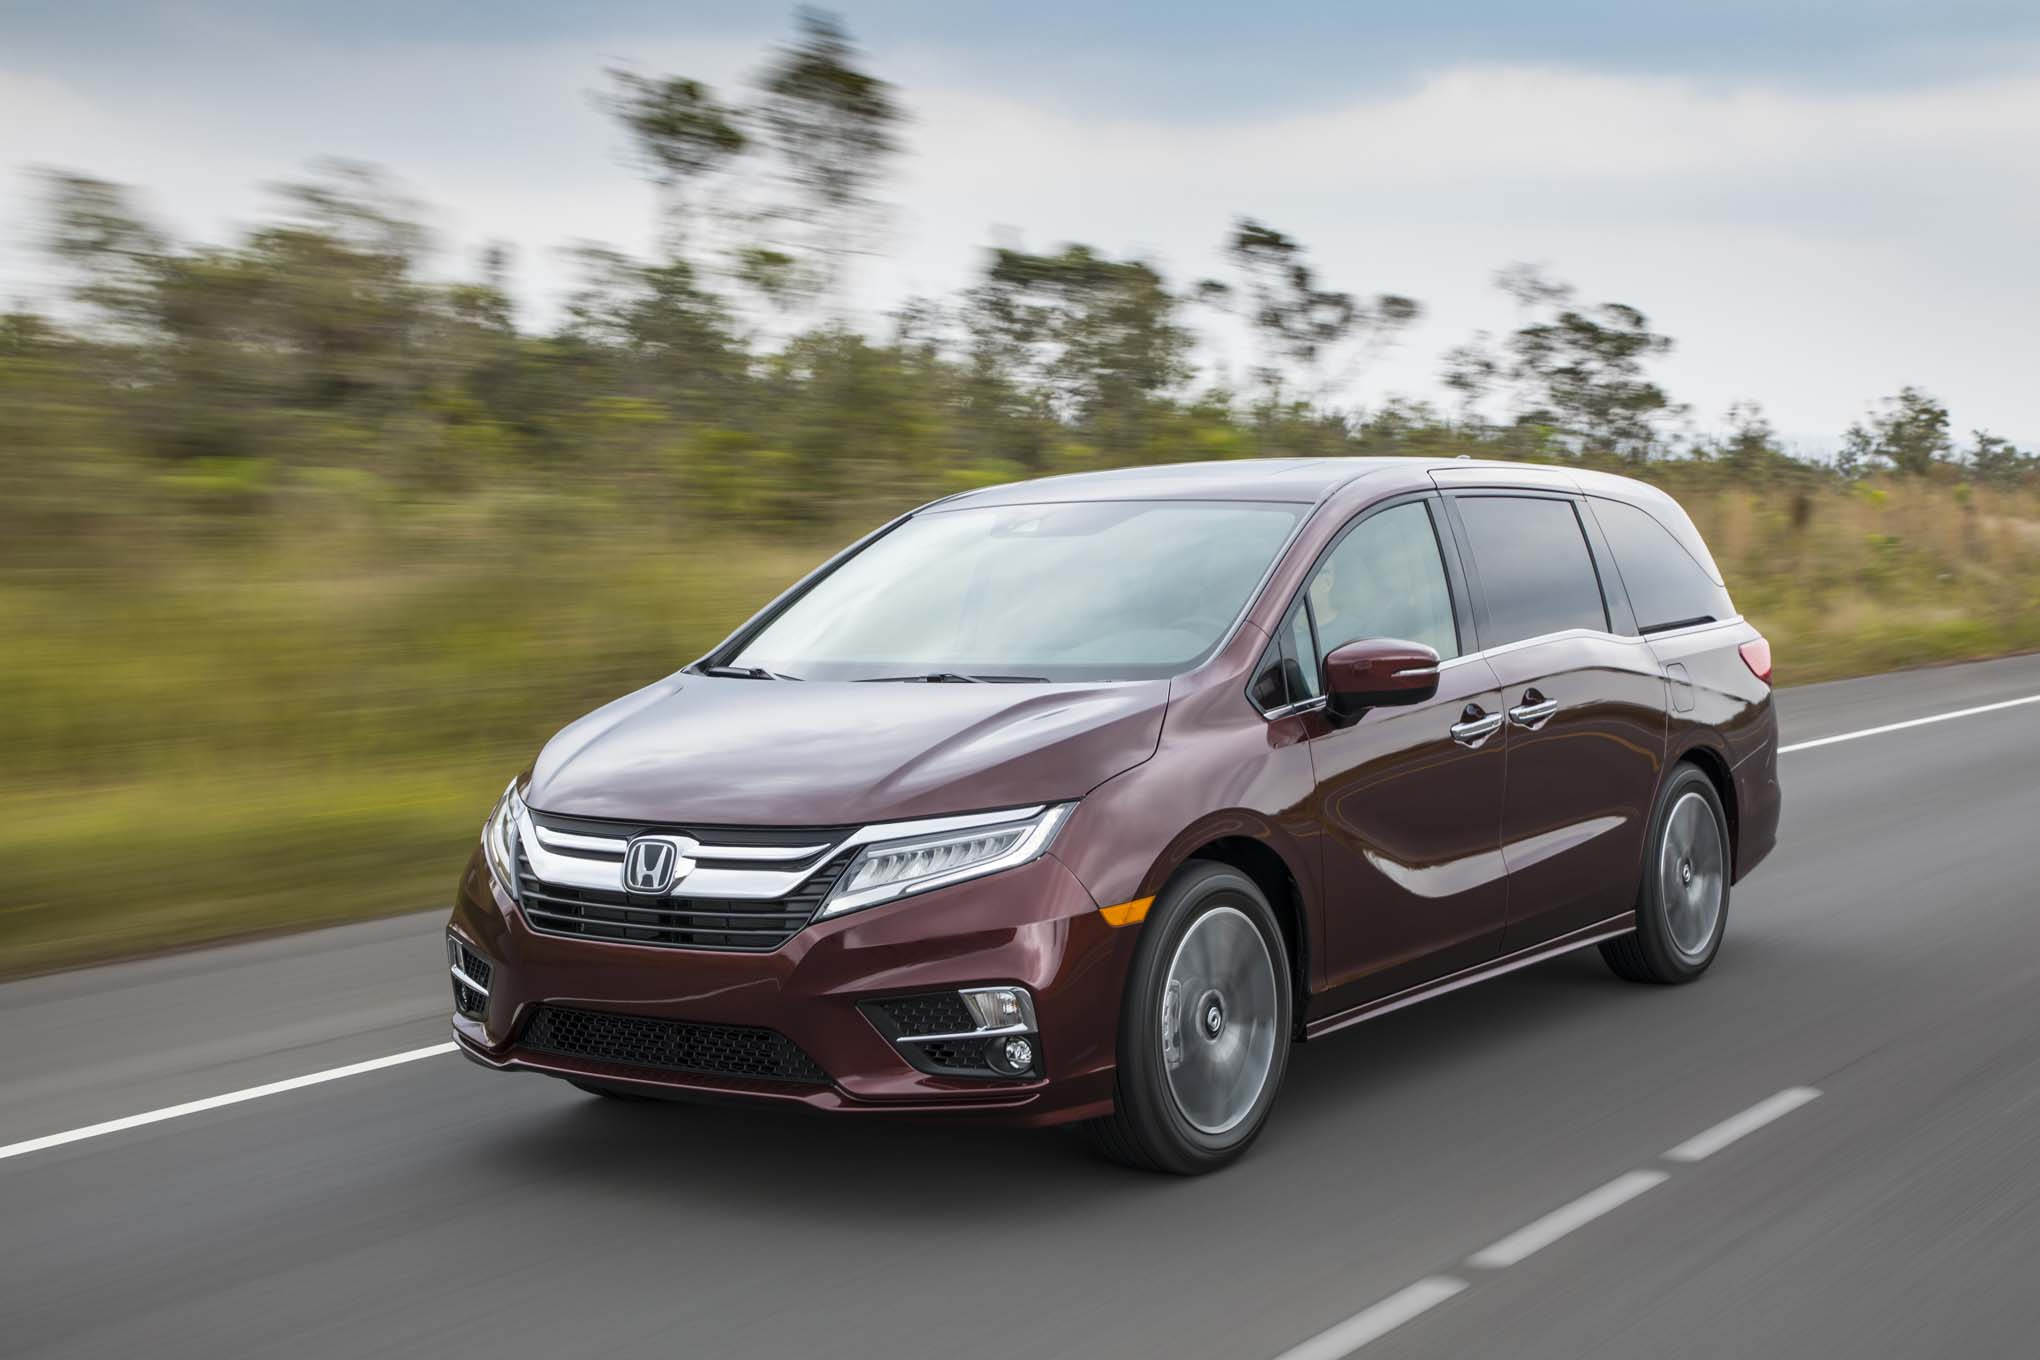 2018 Honda Odyssey Front Three Quarter In Motion 08